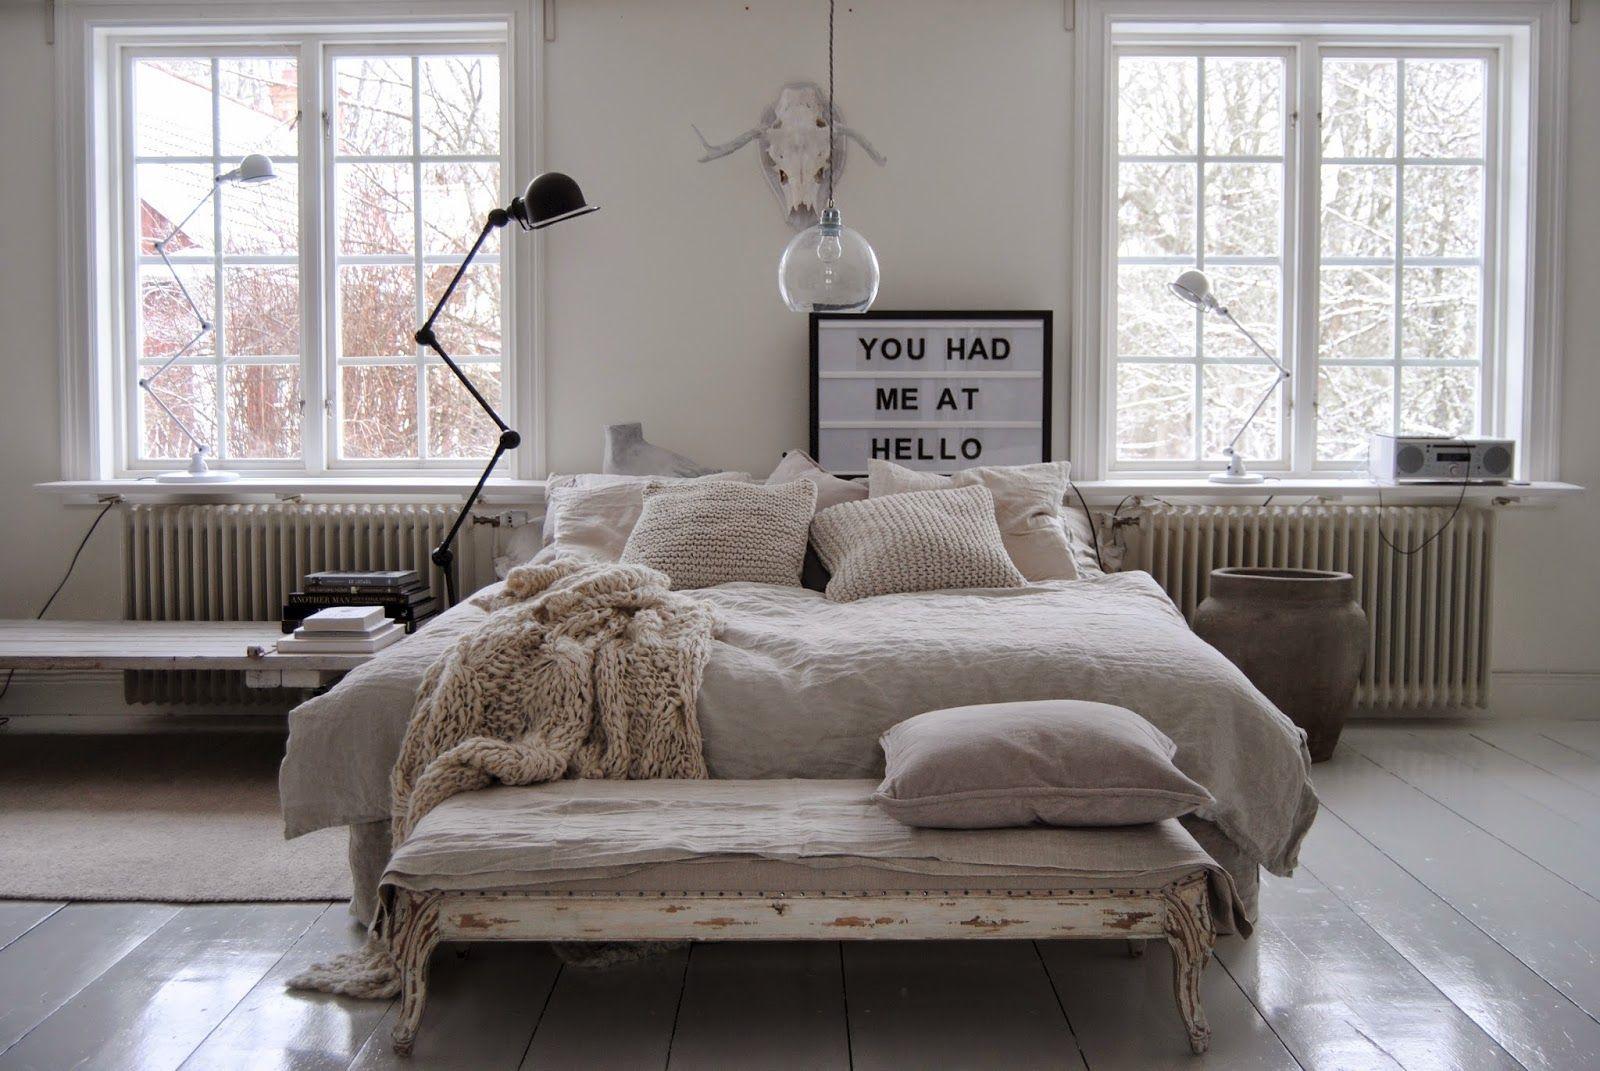 Stay in bed (B I S K O P S G Å R D E N) Kodin sisustus